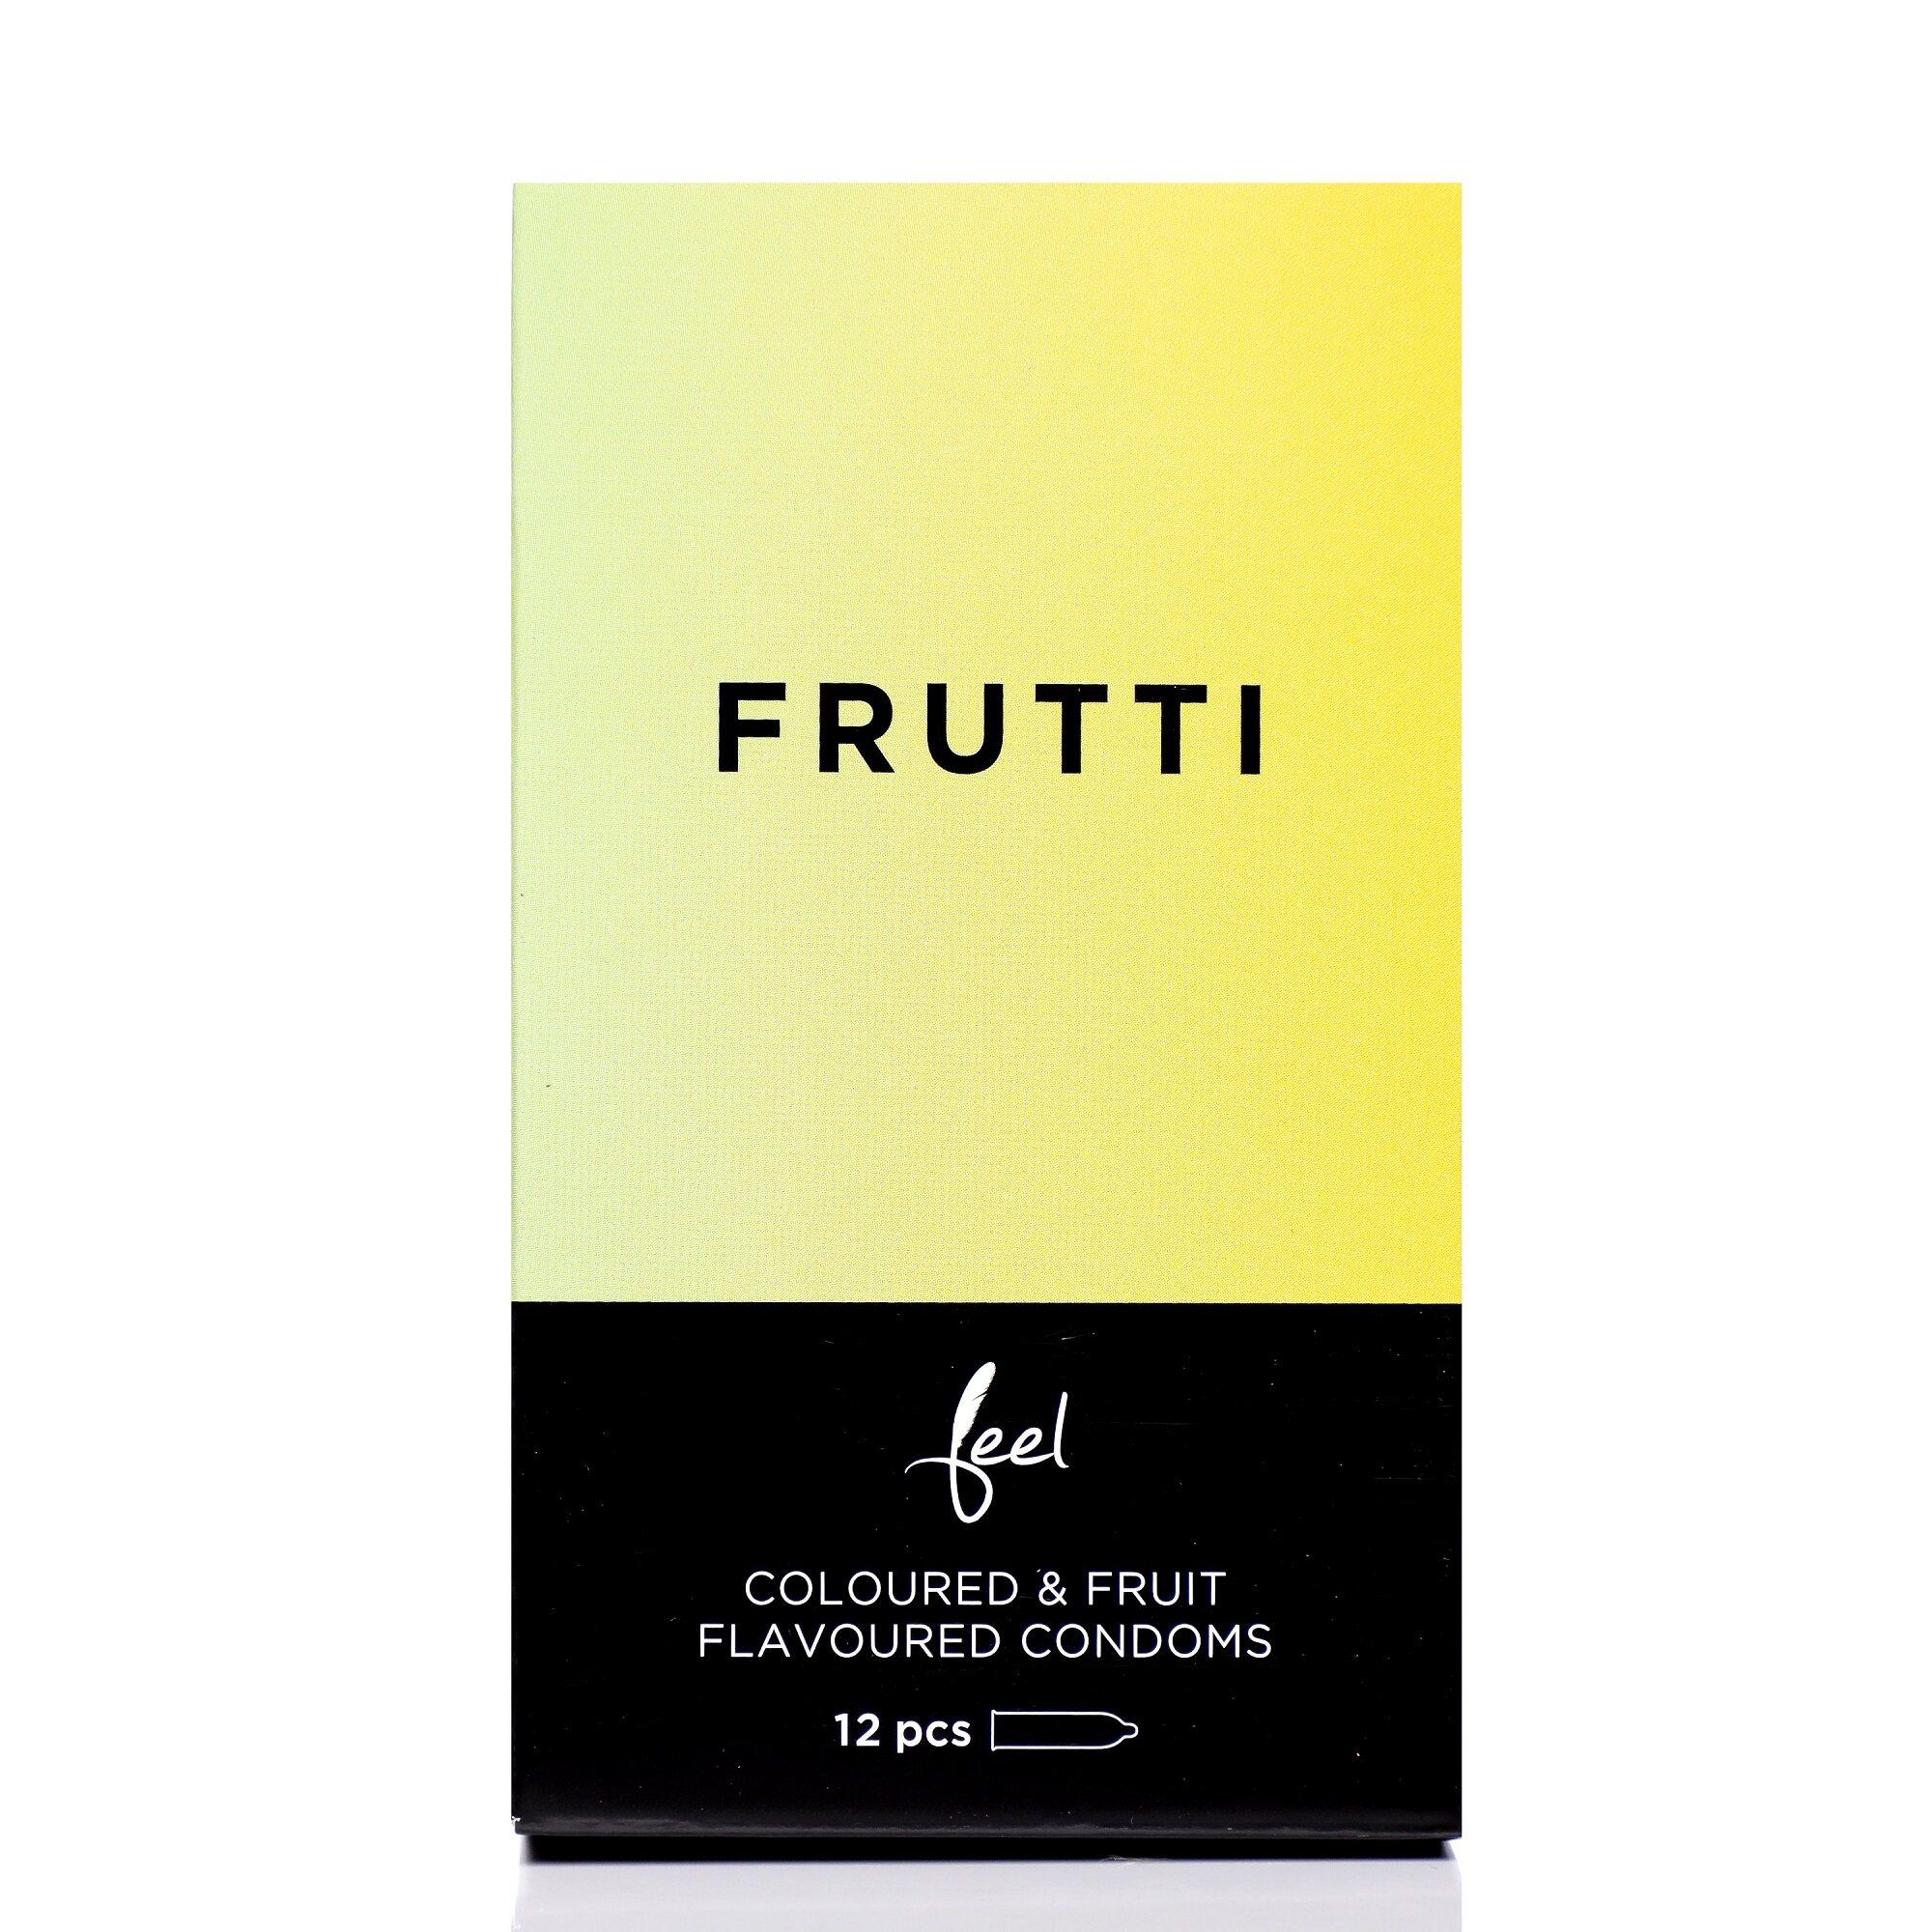 Nulatex Feel Frutti Coloured & Fruit Flavoured Condoms 12pcs